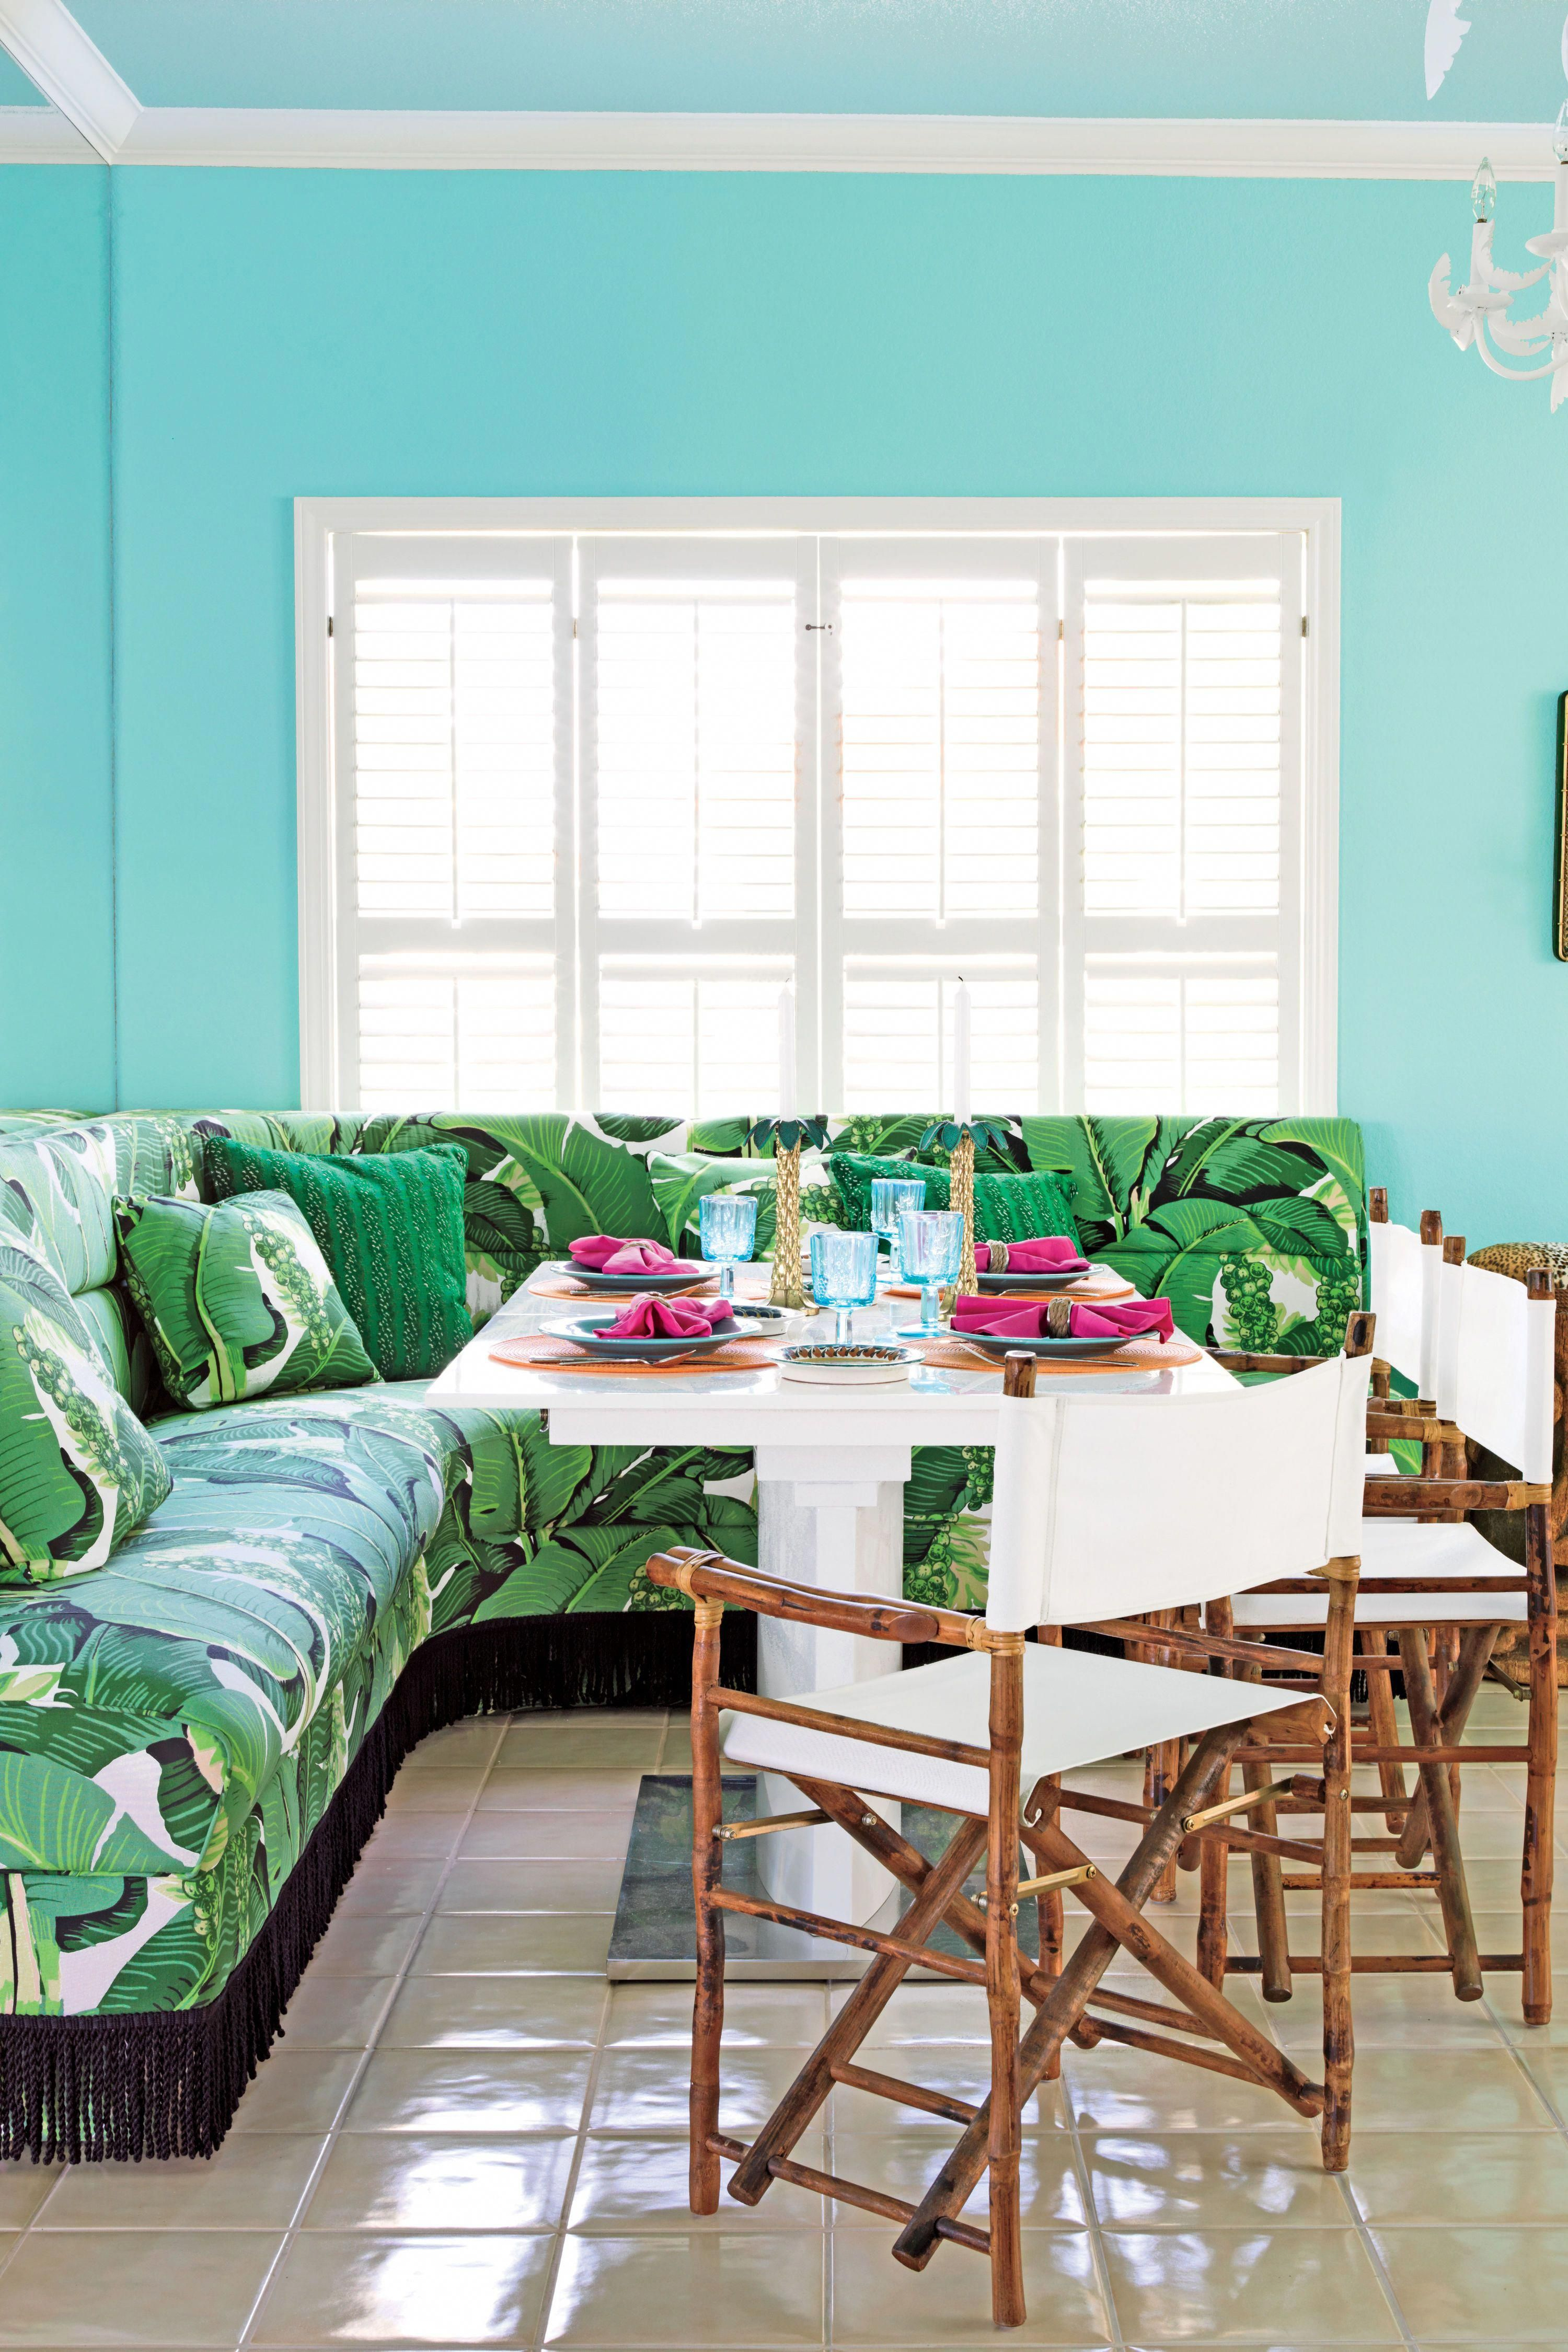 Tropical Colors Tropicaldecor Tropical Living Room Tropical Dining Room Tropical Home Decor #tropical #decor #living #room